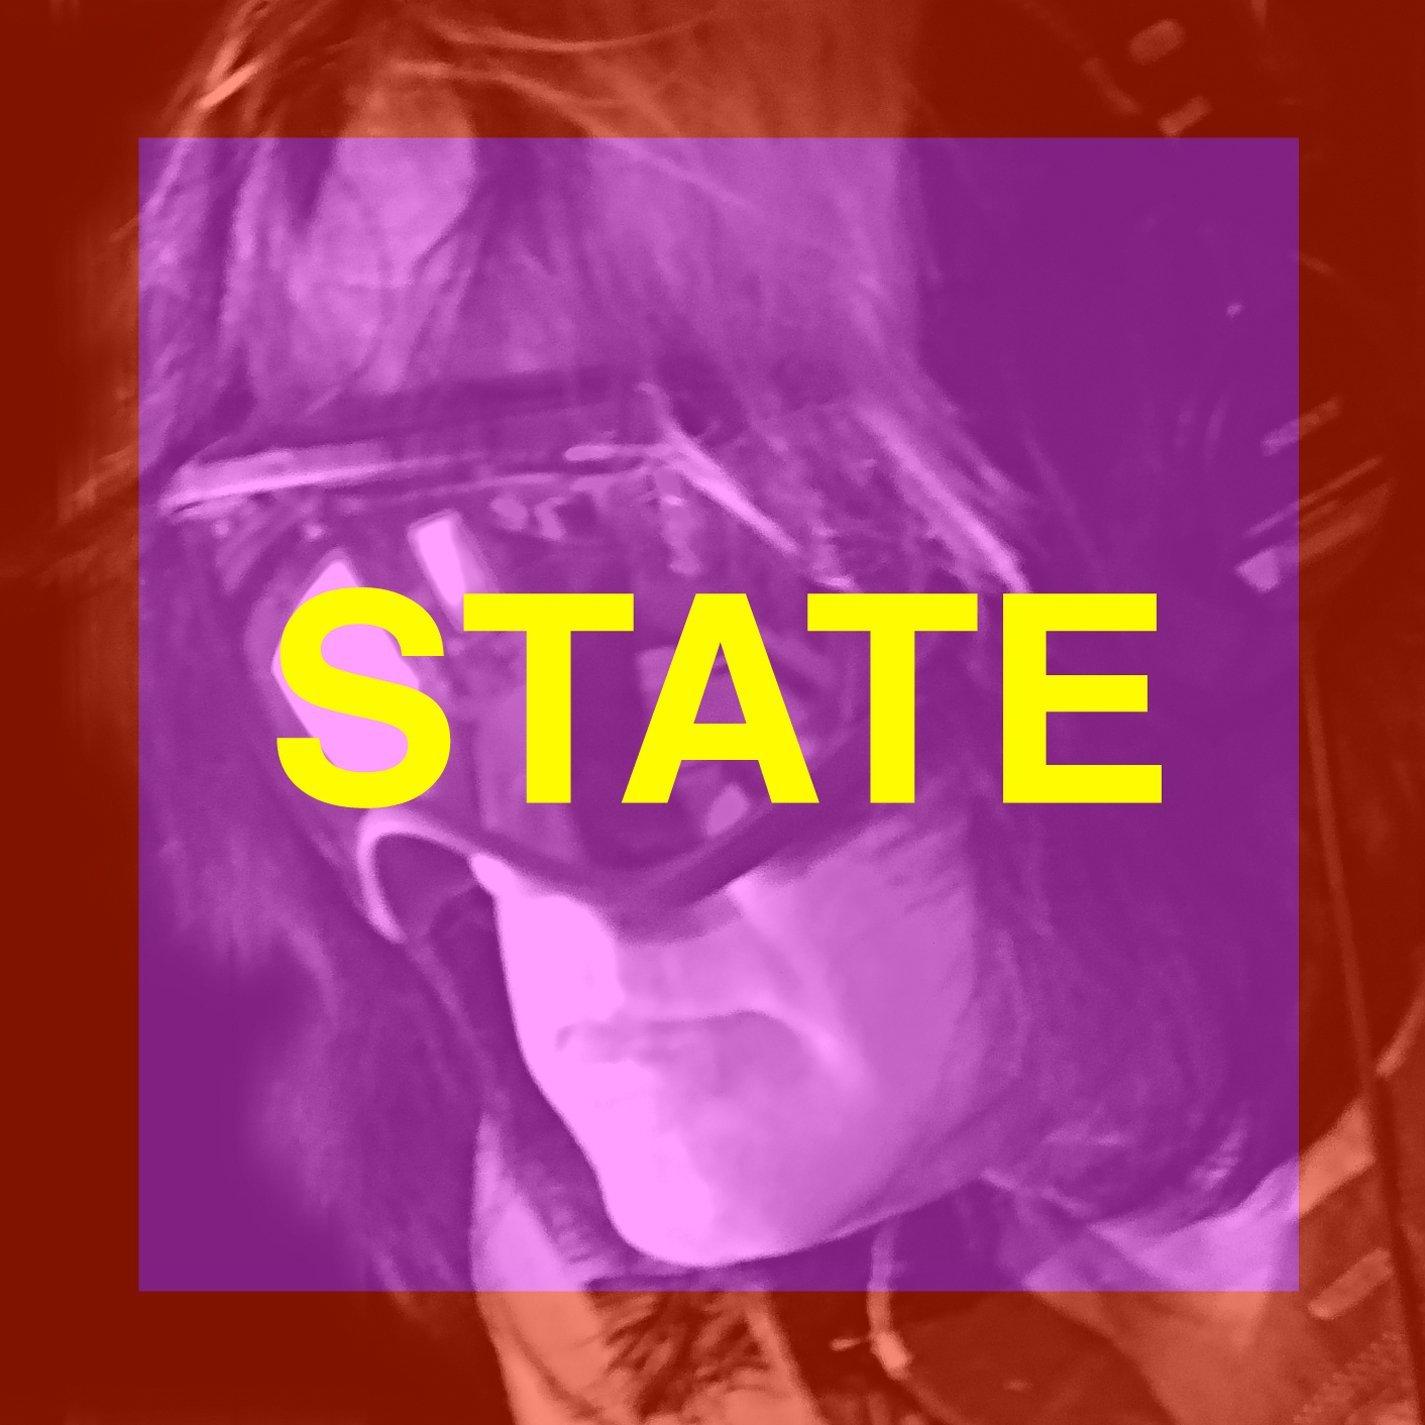 todd-rundgren-state-cover